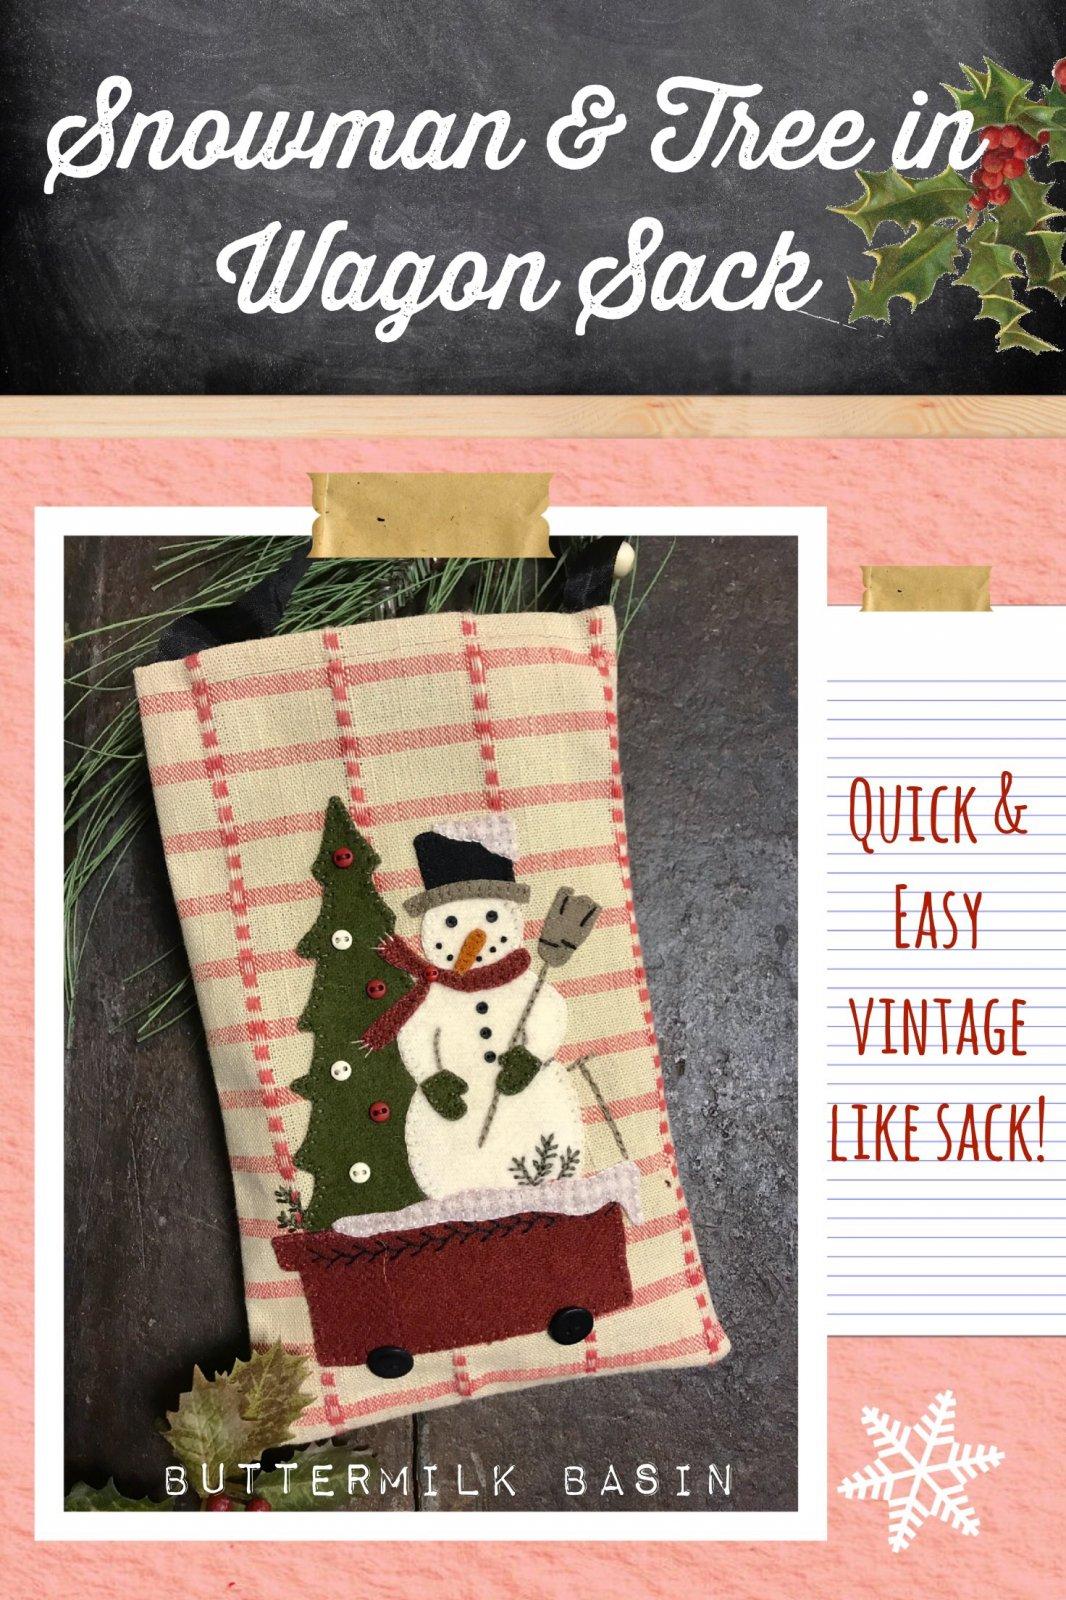 Snowman & Tree in Wagon Sack Pattern